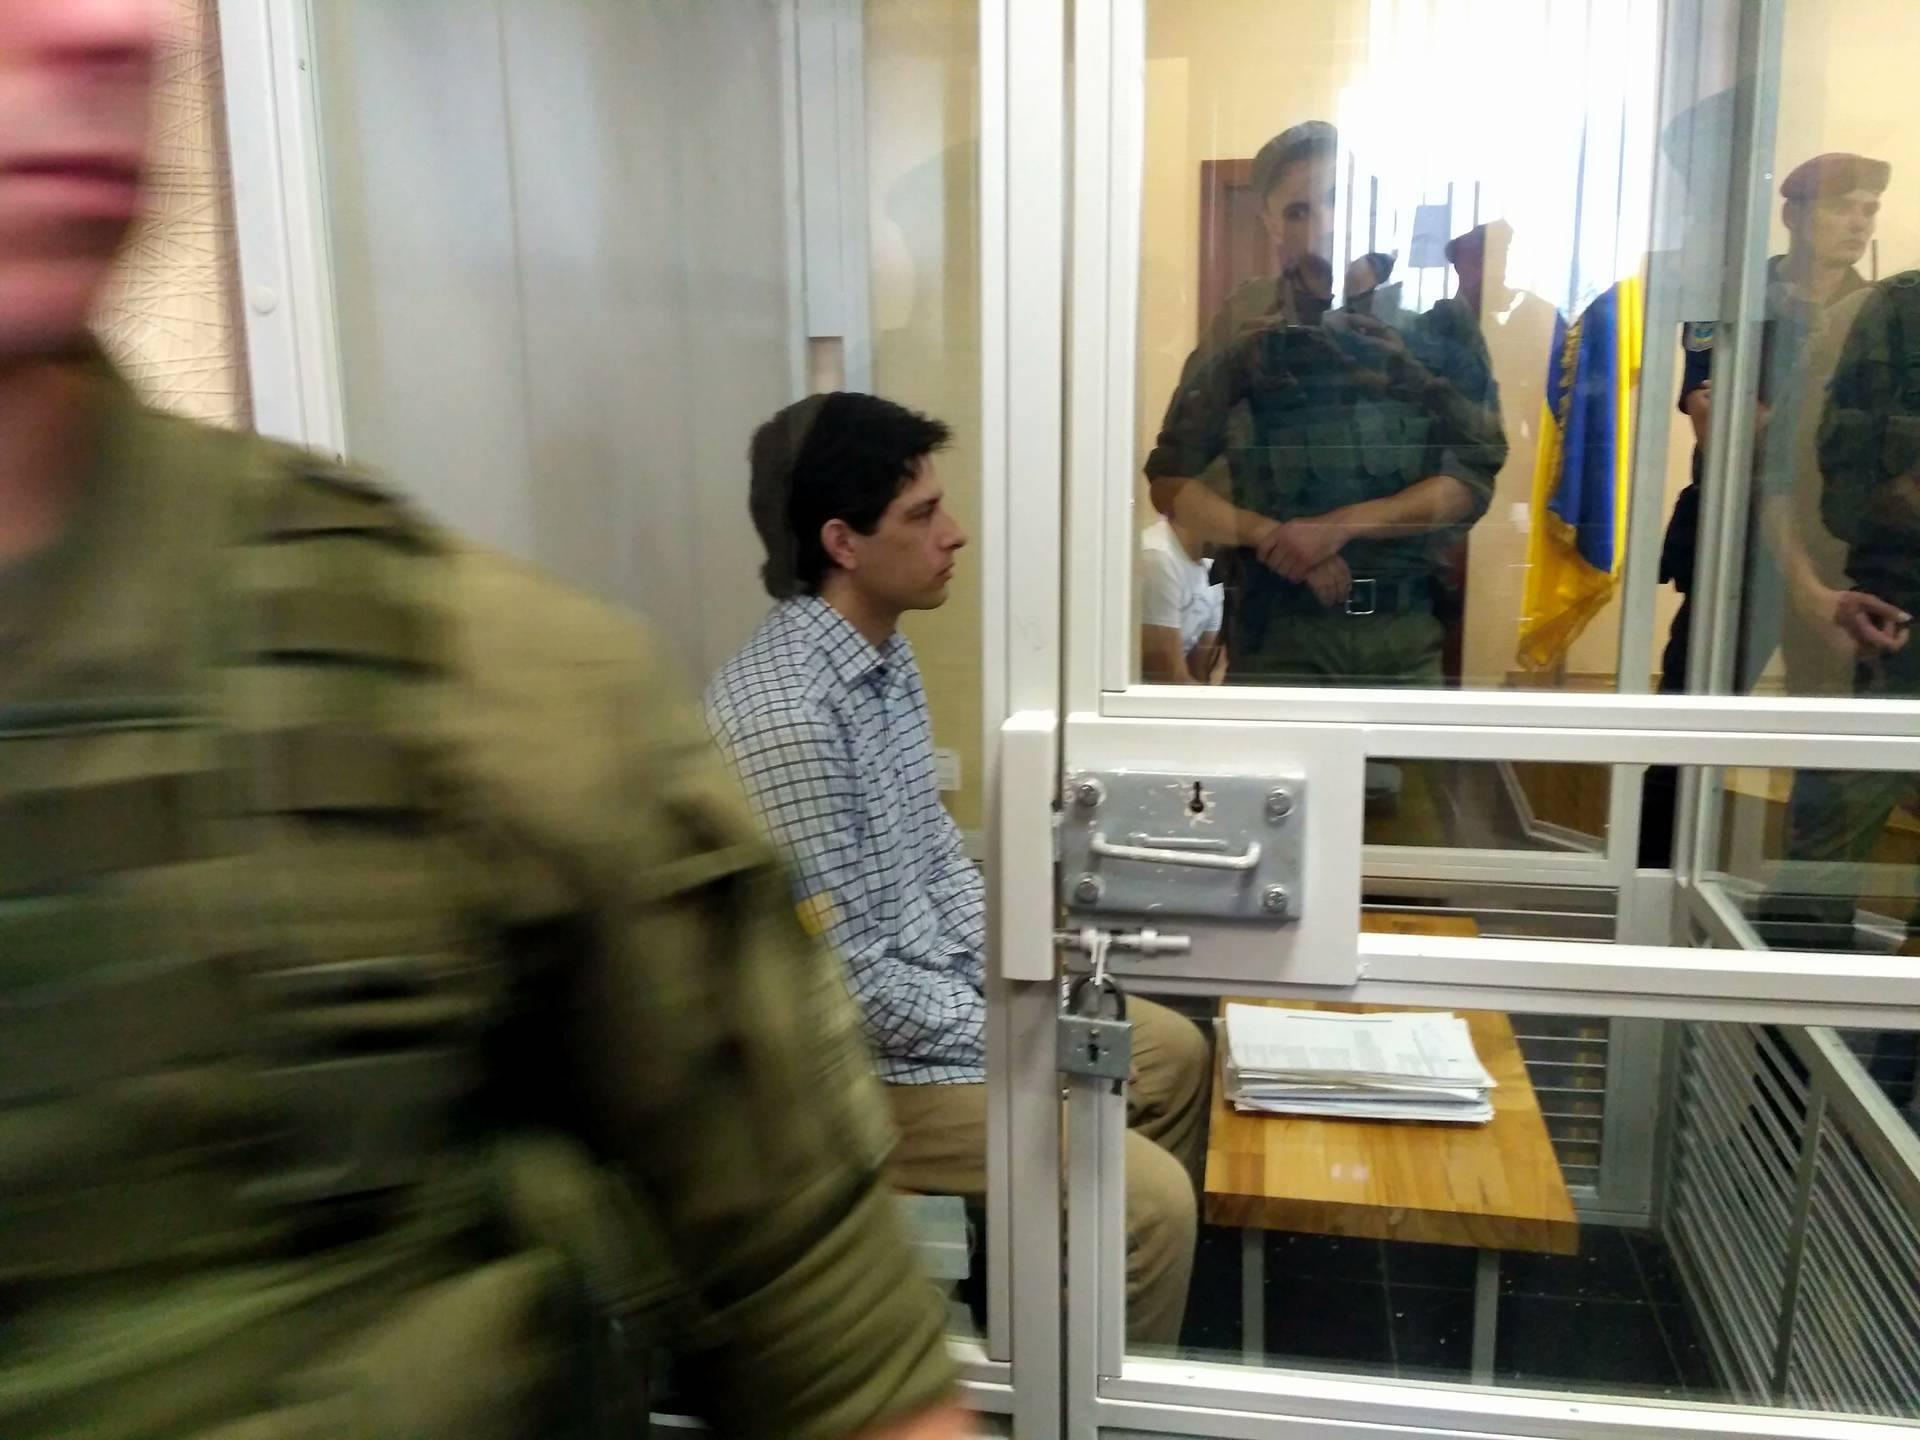 Апелляционный суд отменил вердикт бразильскому террористу ЛДНР